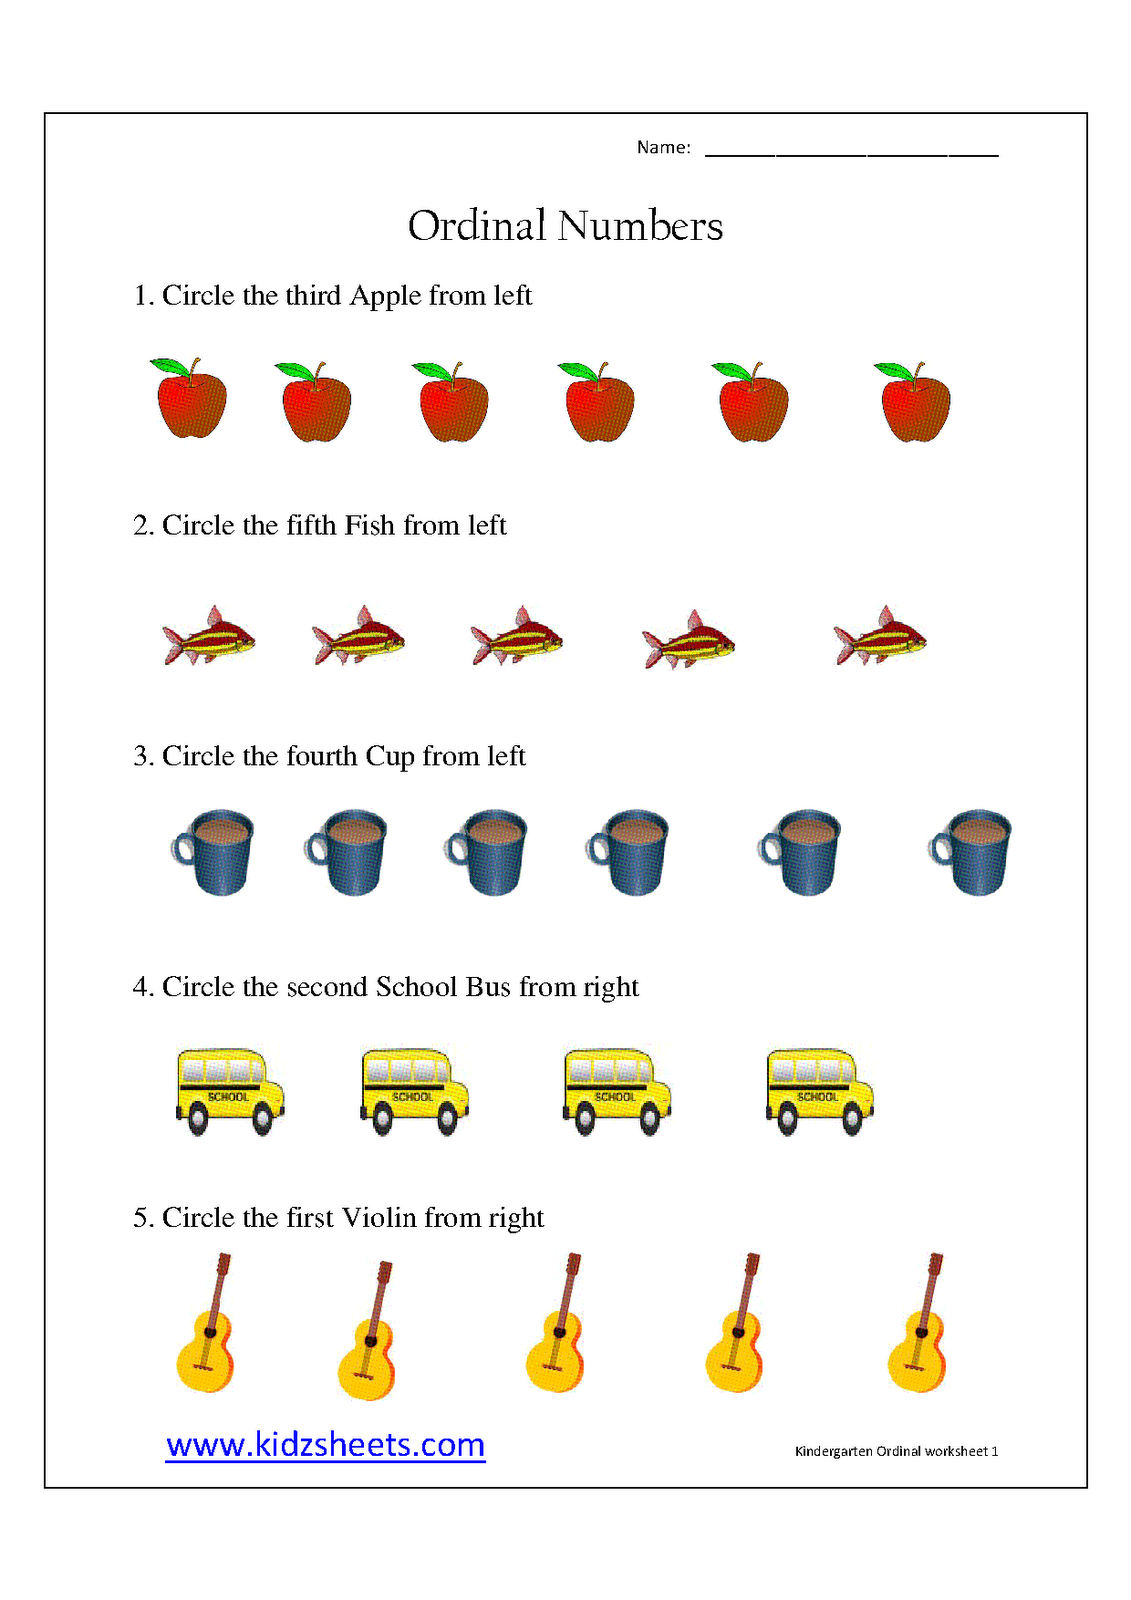 Ordinal Numbers Worksheets Kindergarten